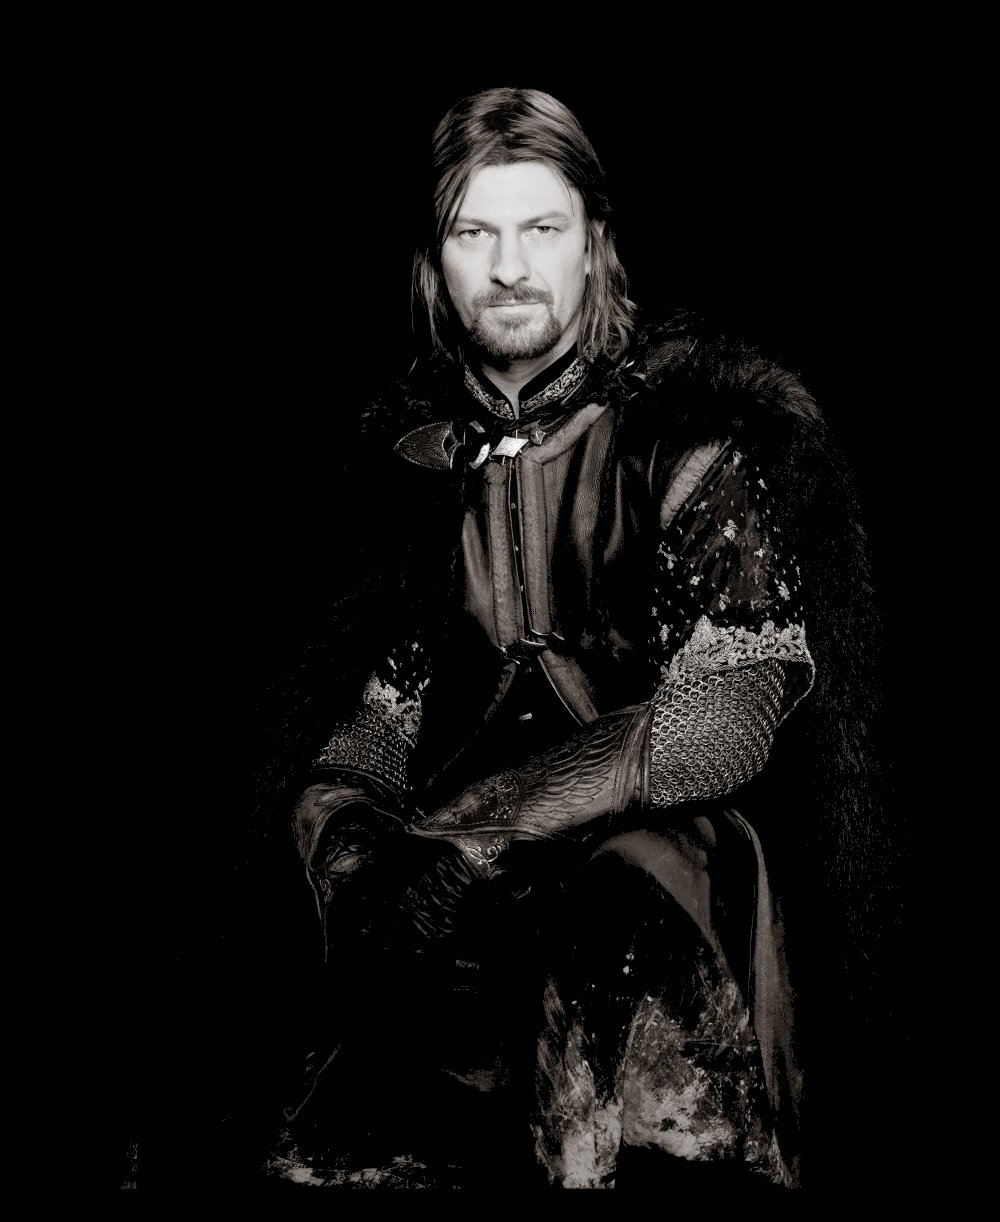 http://smeagel.webs.com/photos/Boromir/4759008.jpg